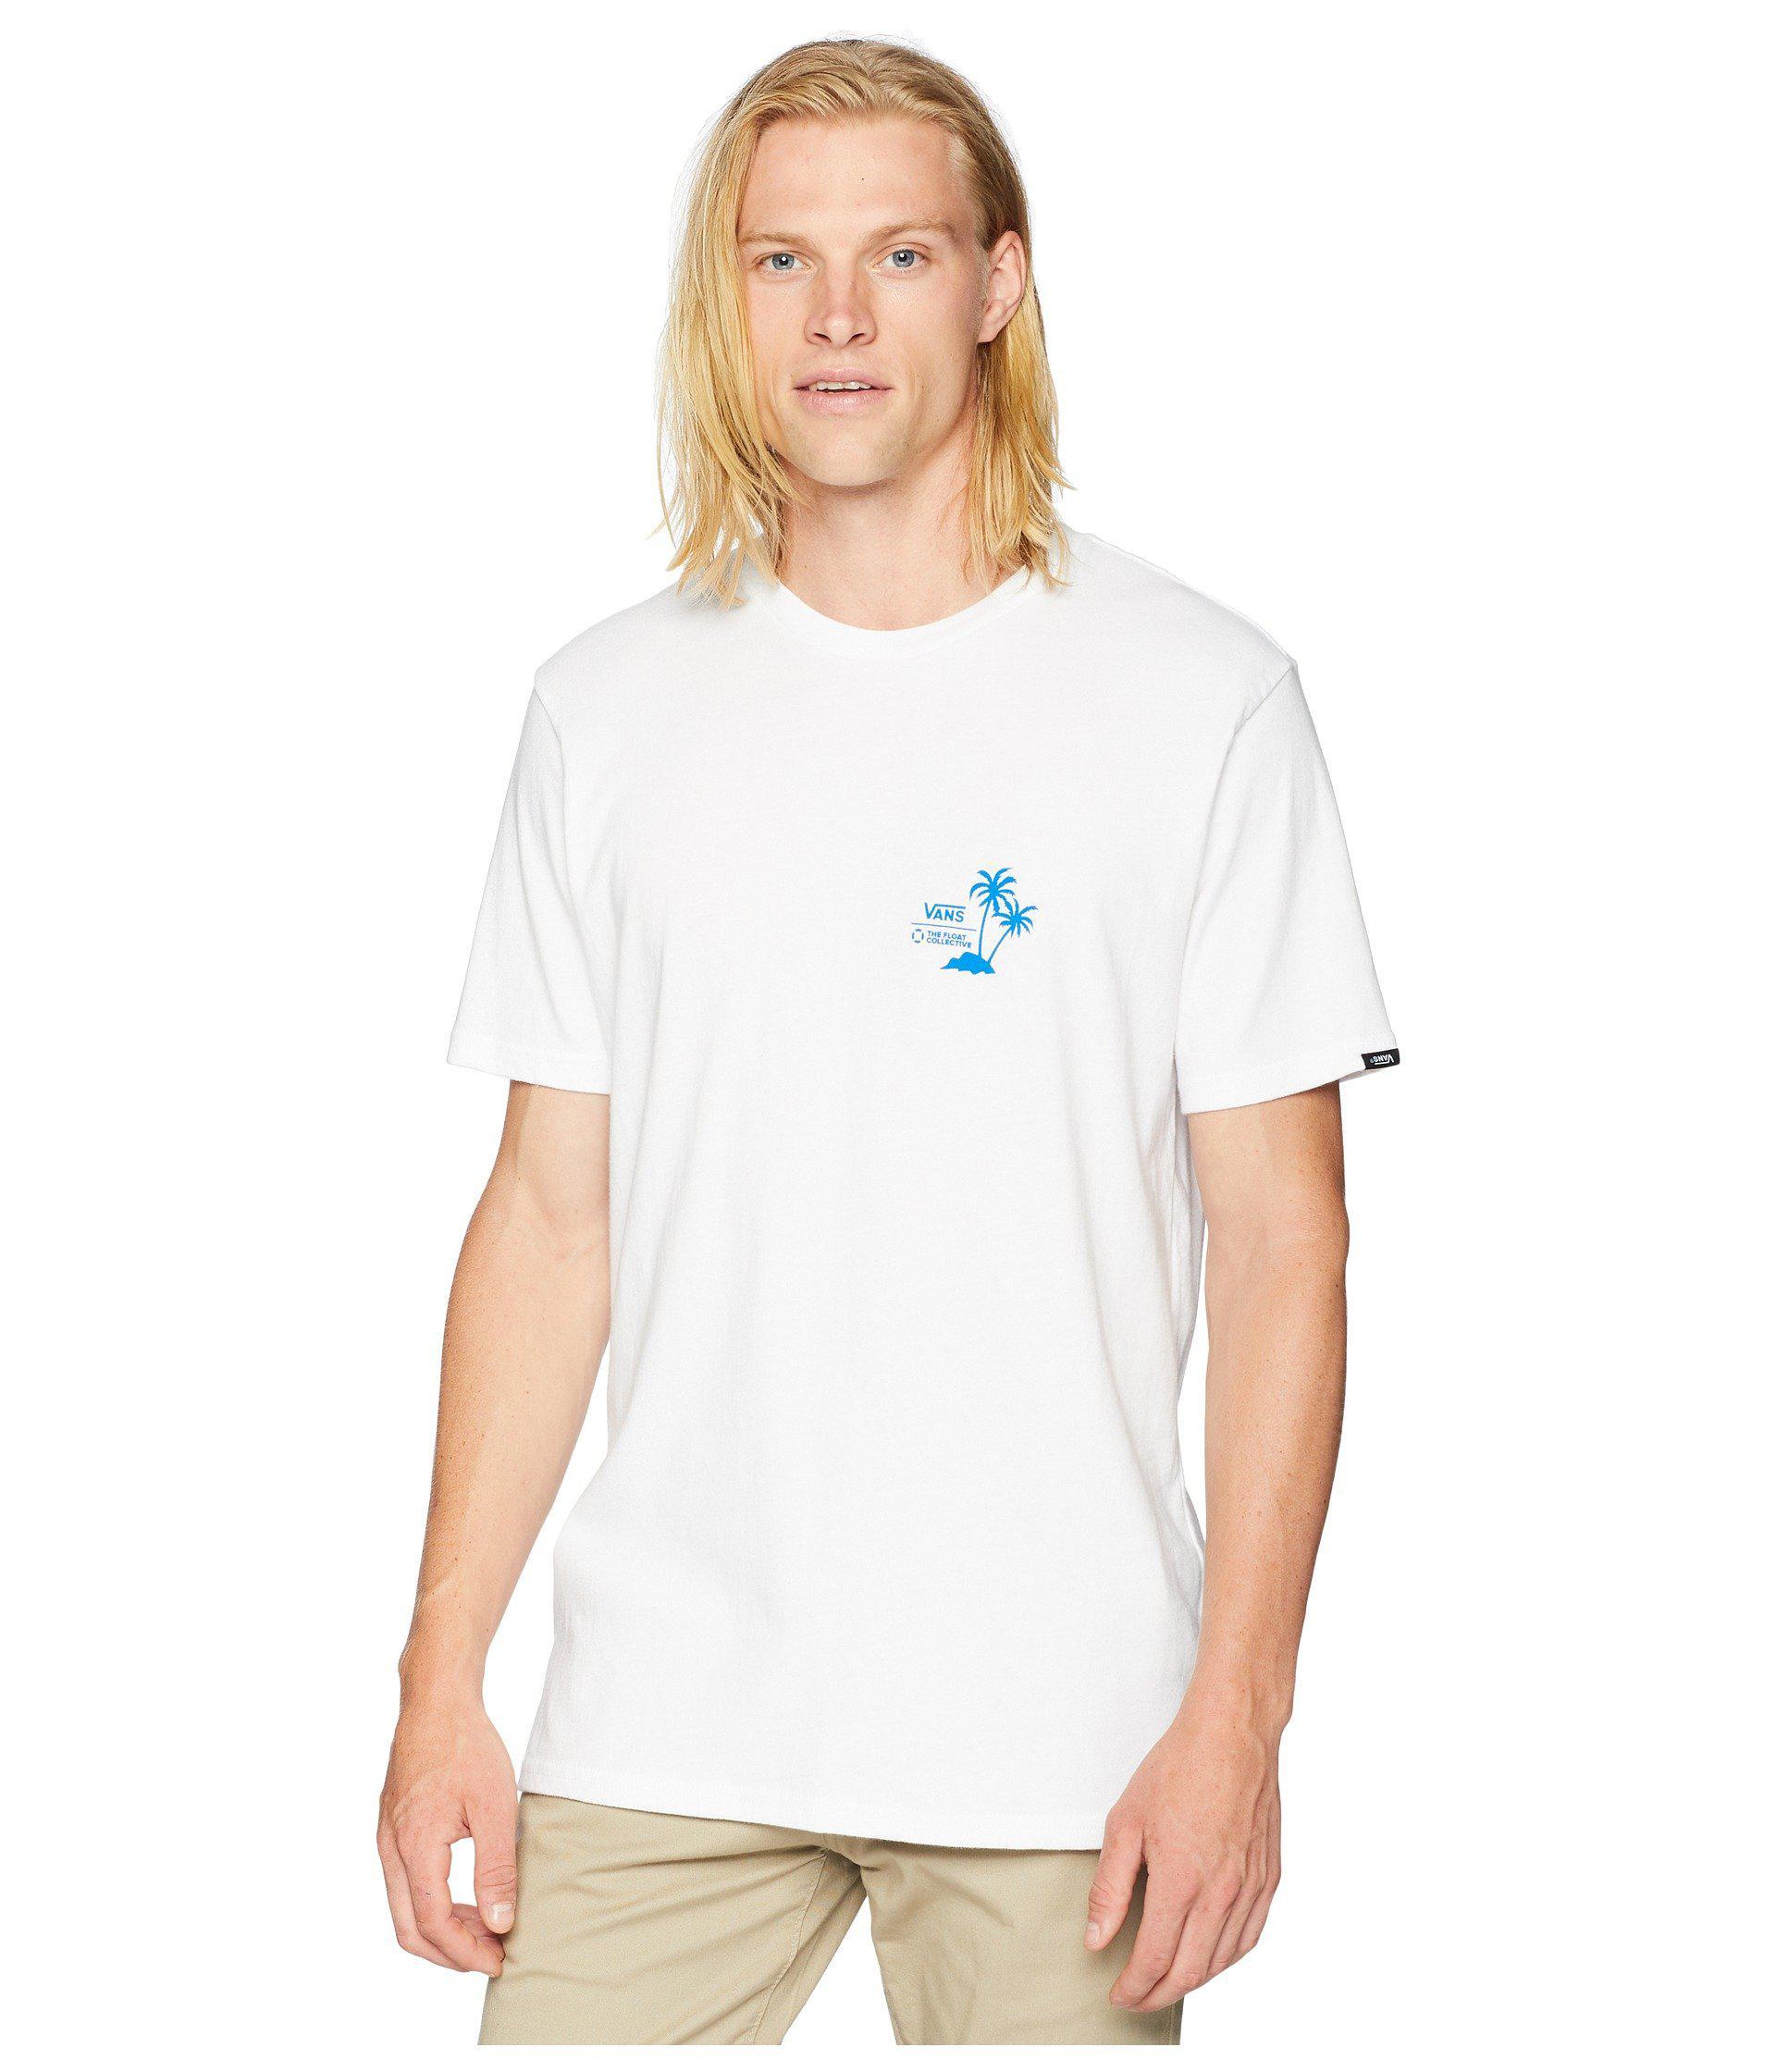 e5ed8759ef Vans - White X Float Collective T-shirt for Men - Lyst. View fullscreen